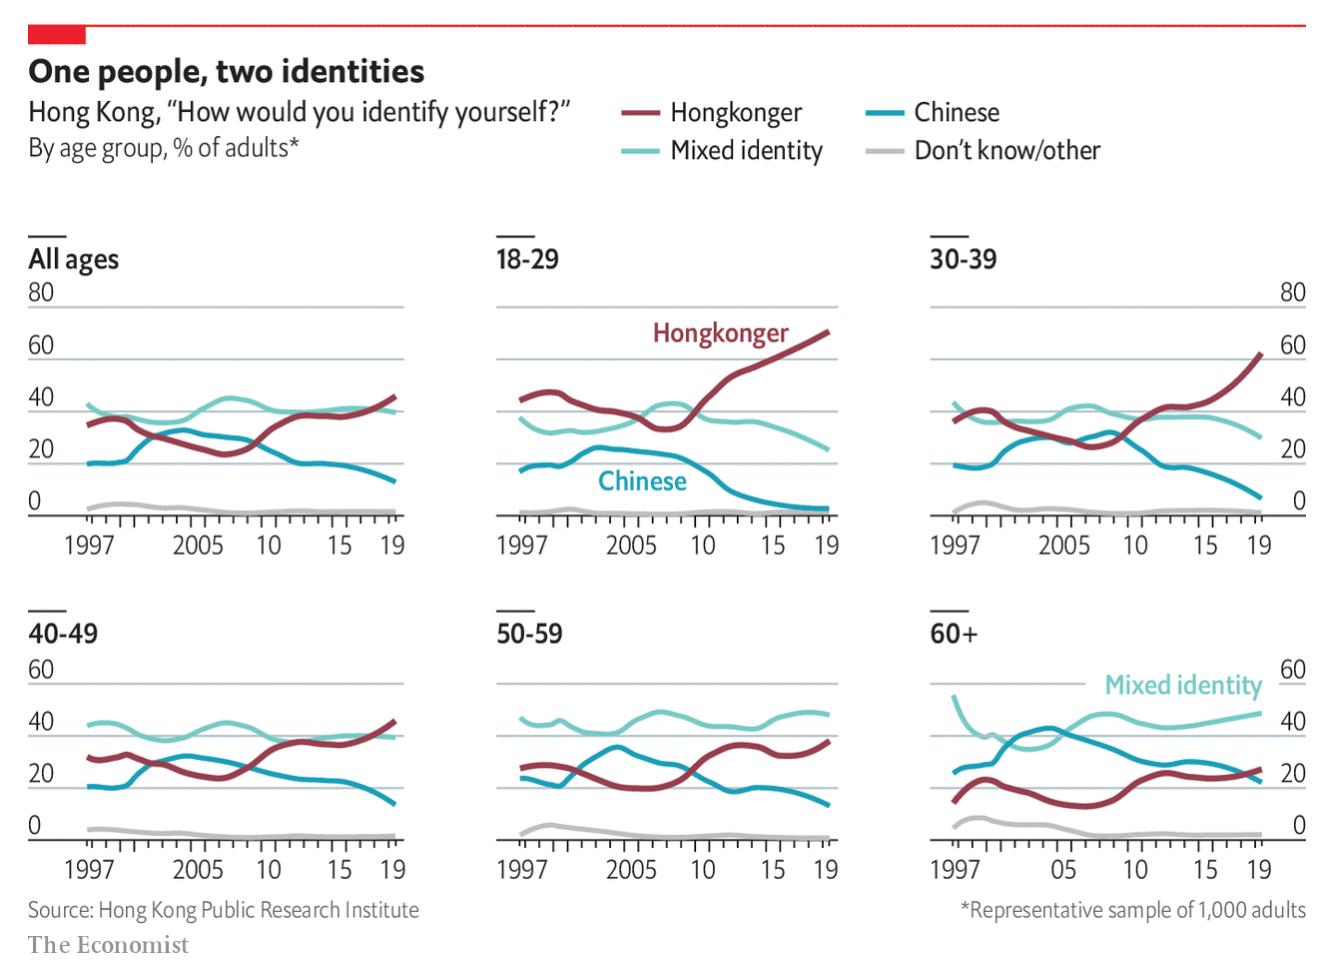 Not a good trend for Beijing